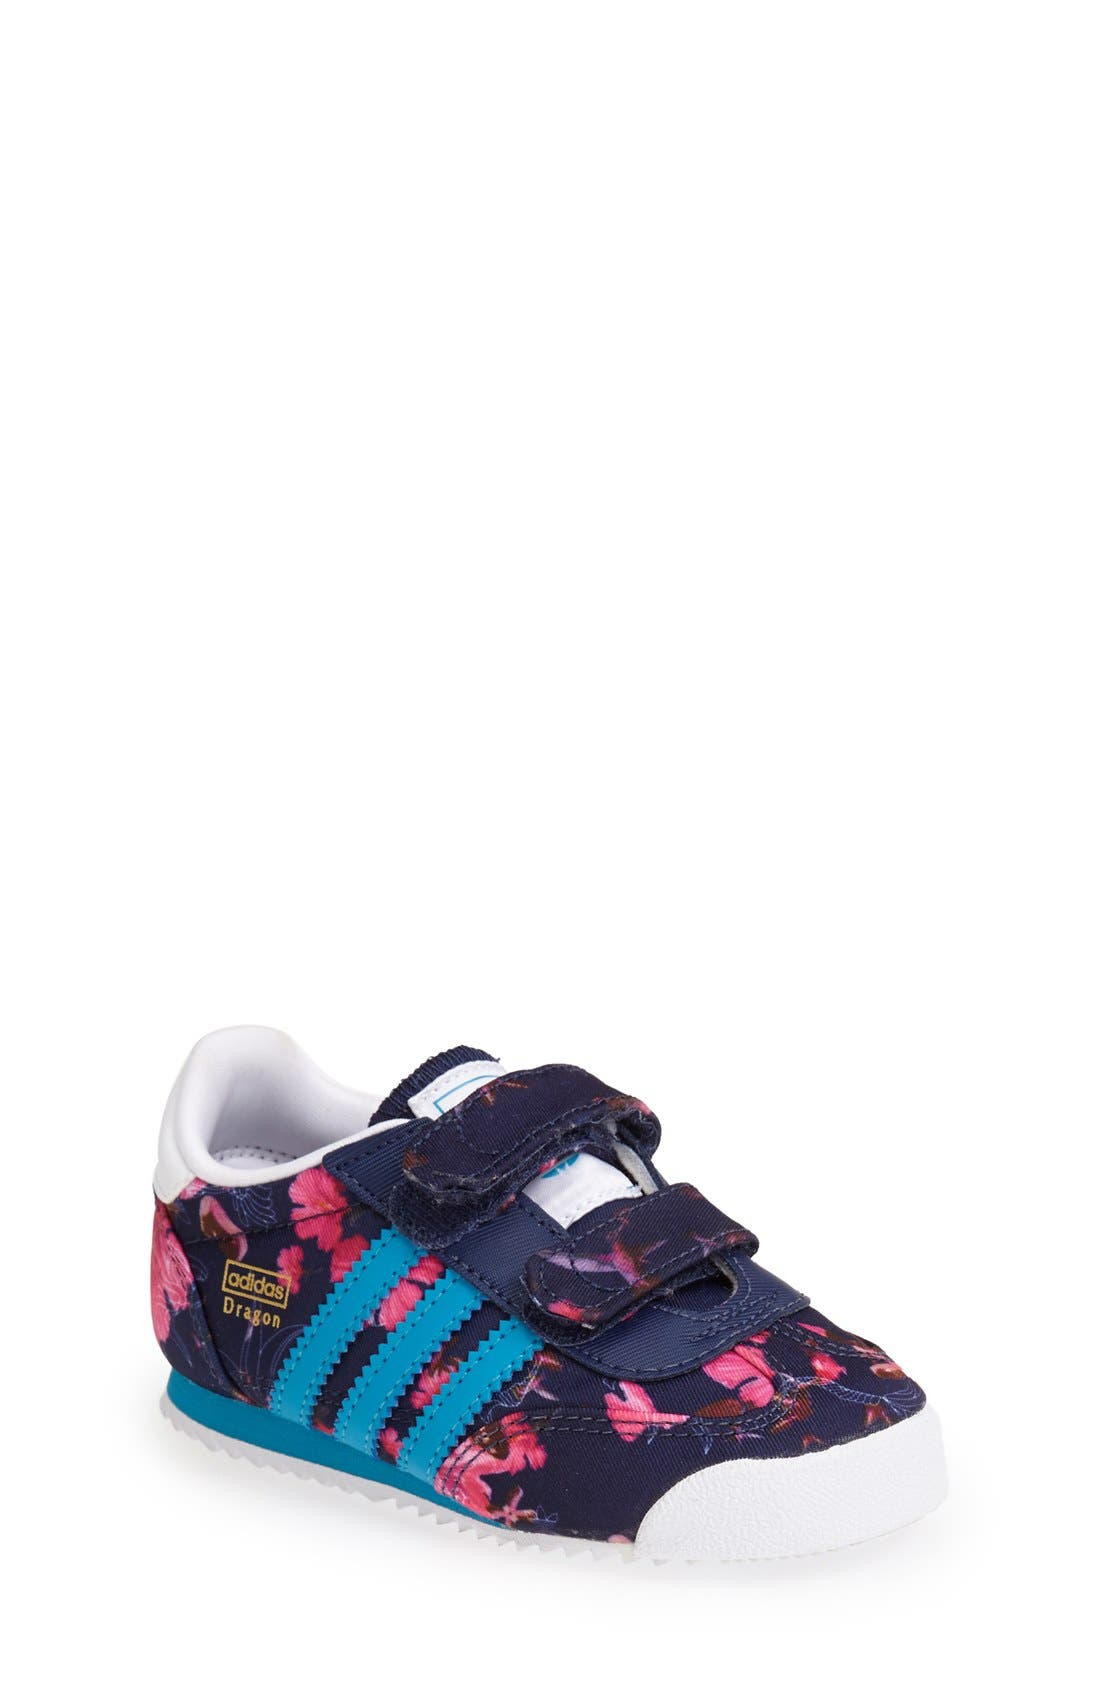 'Dragon - Floral' Sneaker,                             Main thumbnail 1, color,                             100